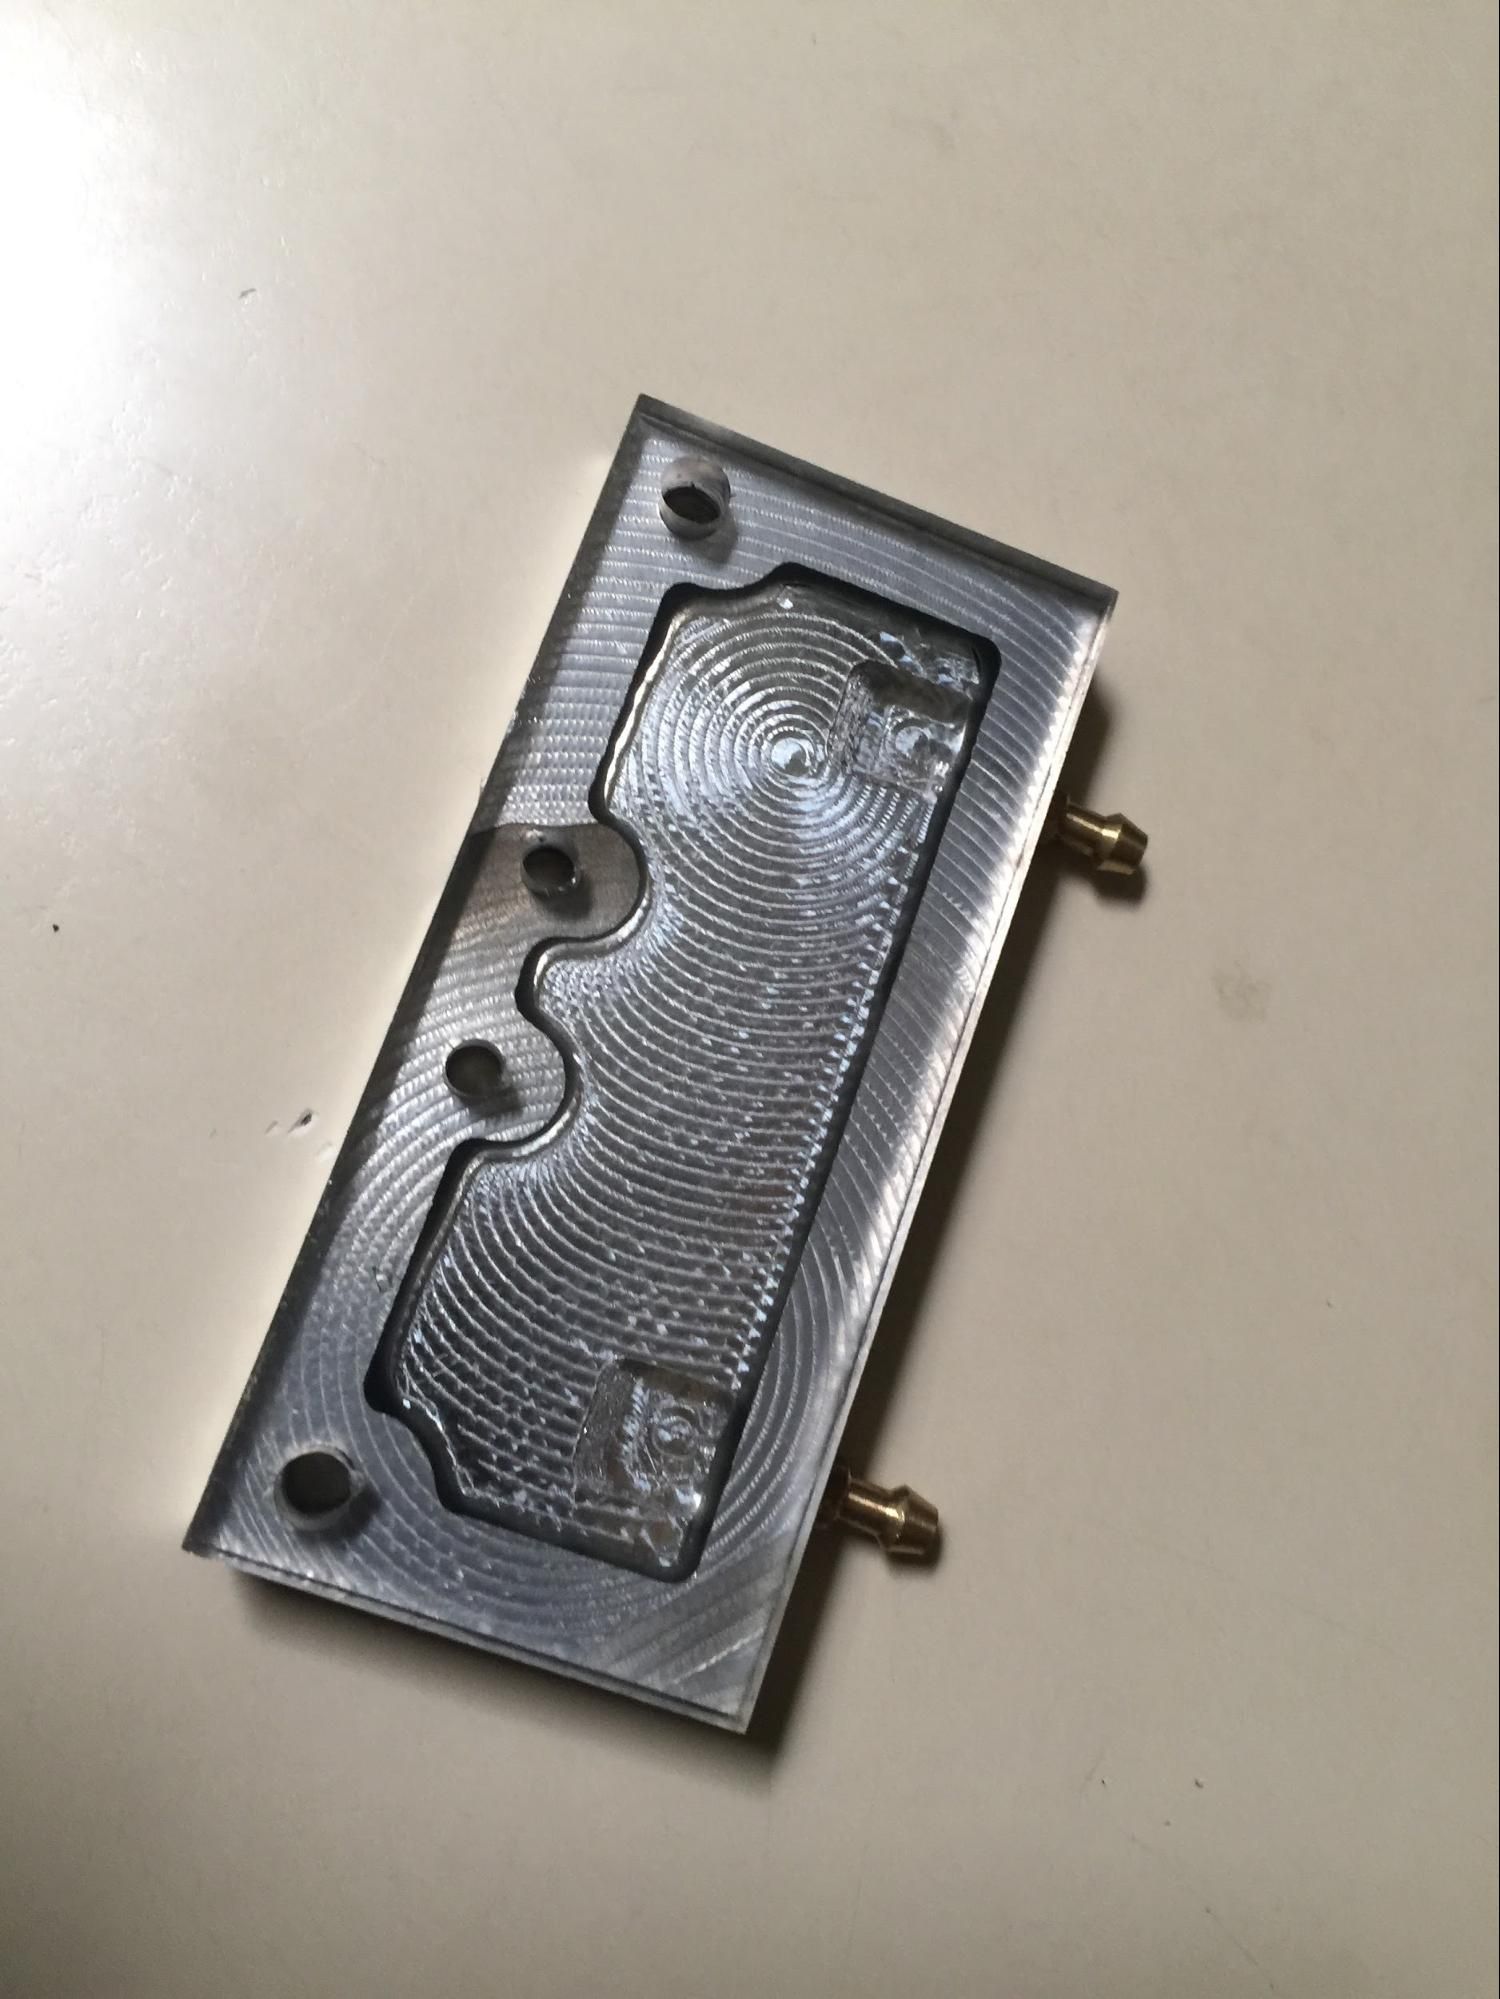 cnc milling water block